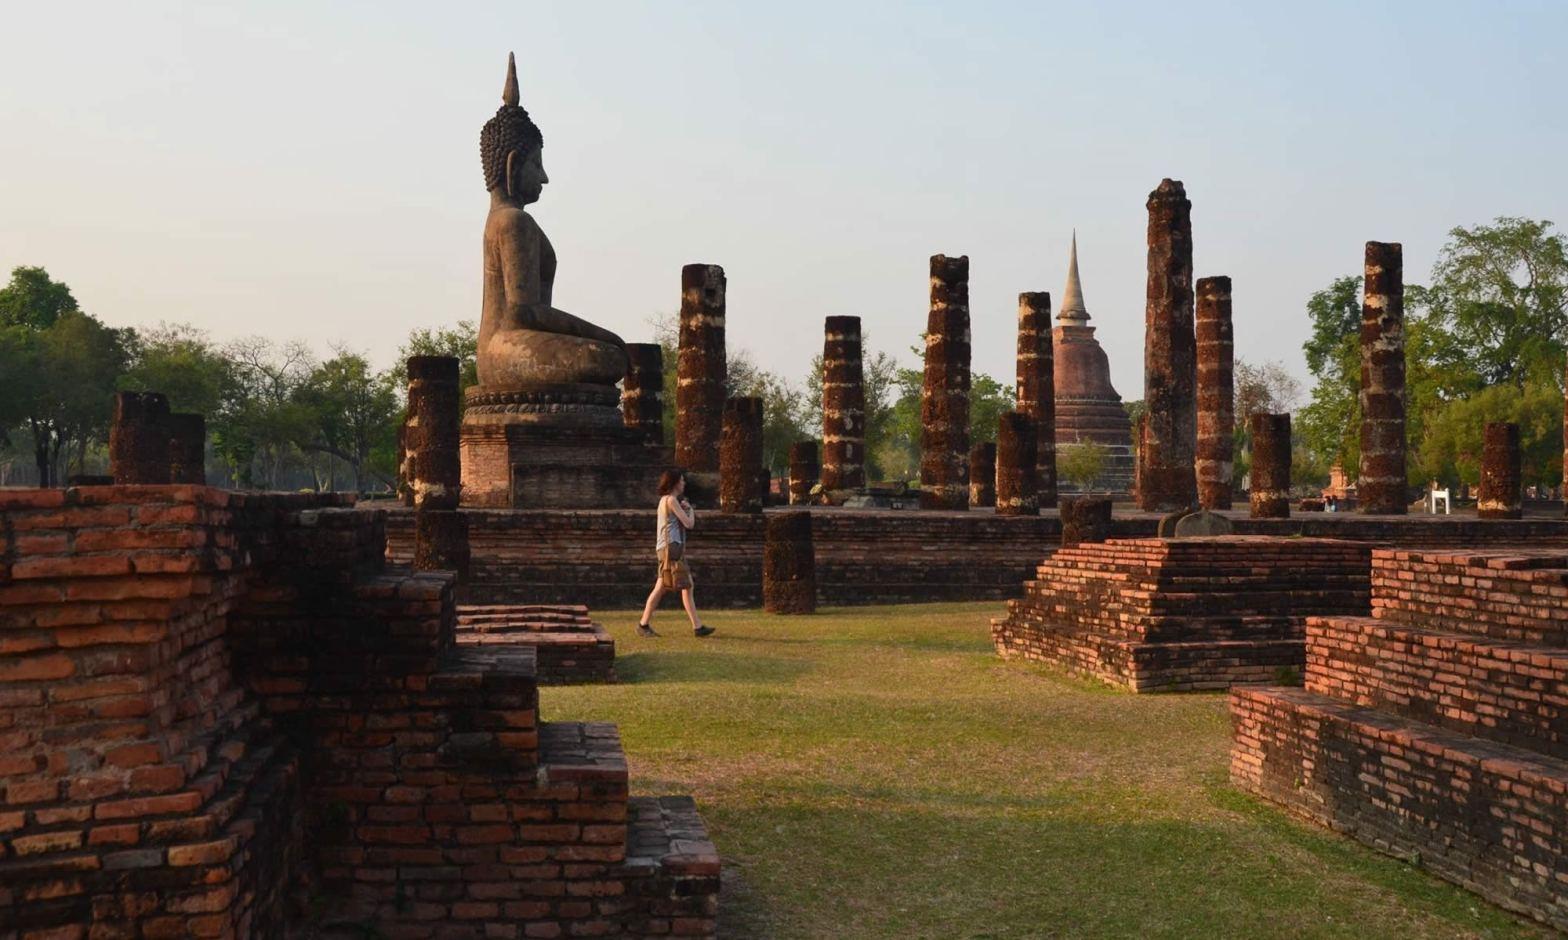 A woman walks Wat Mahathat temple in Thailand's Sukhothai Historical Park.